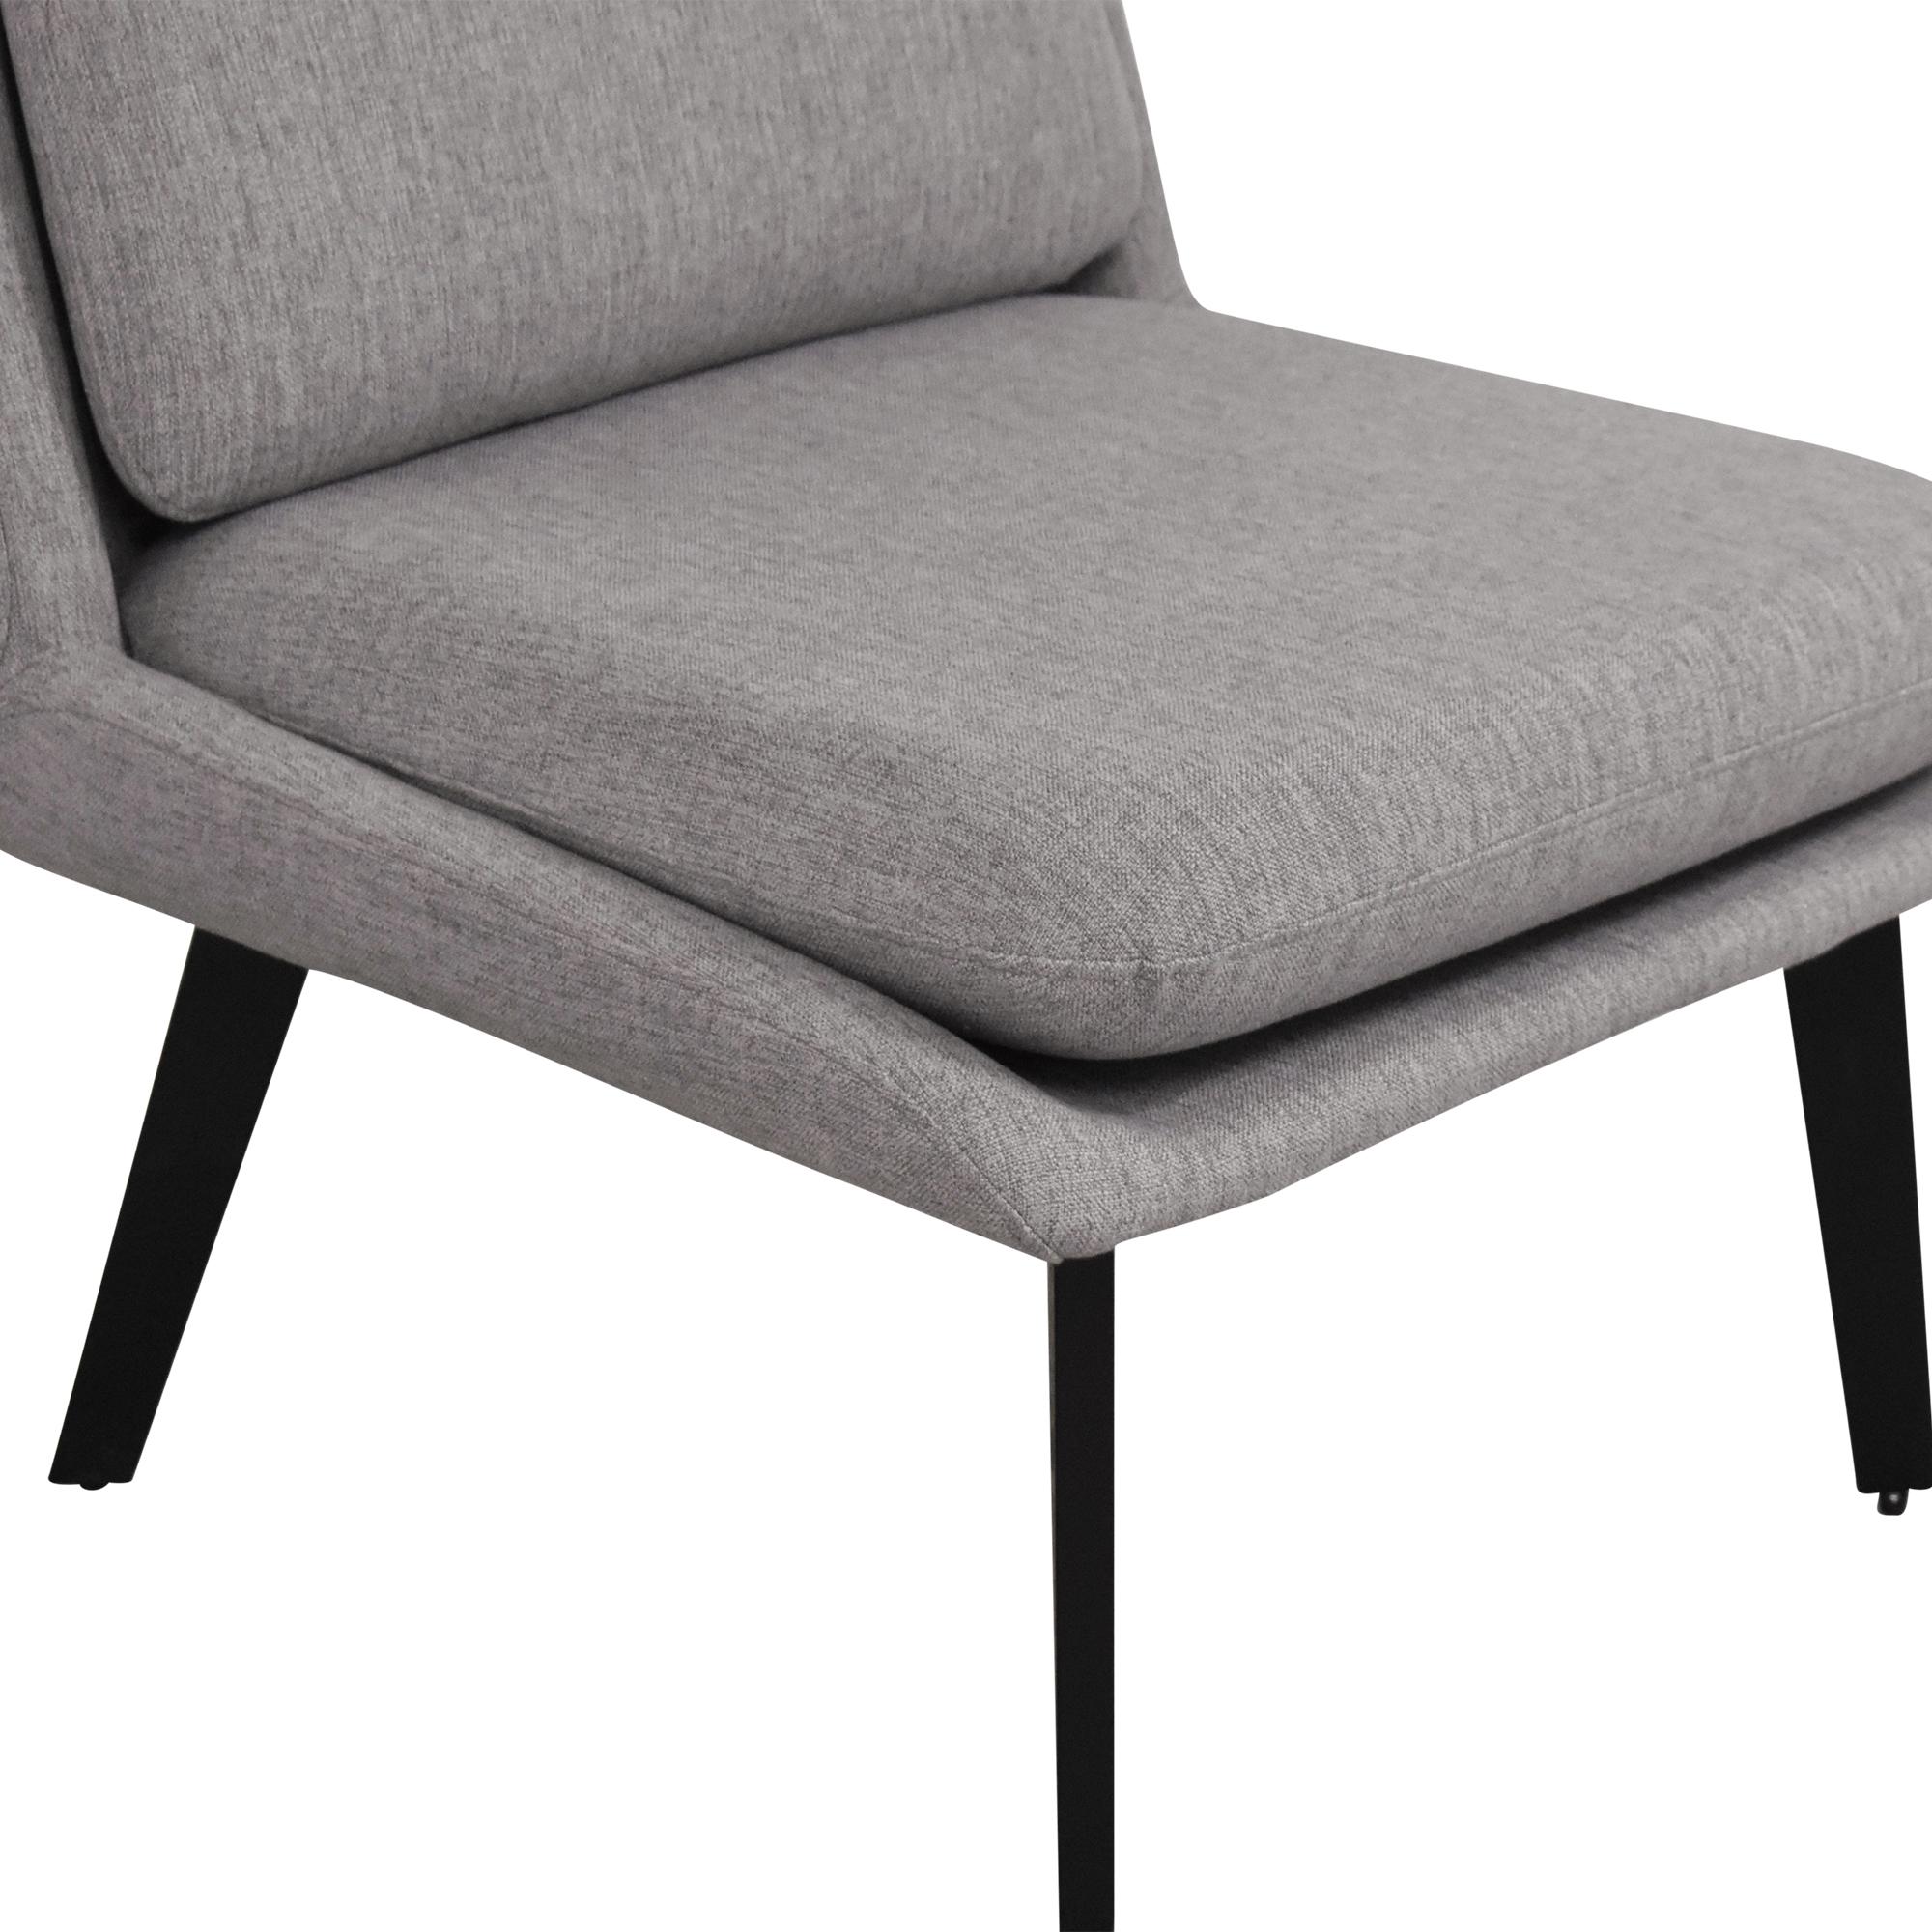 Interior Define Interior Define Hana Slipper Chair used